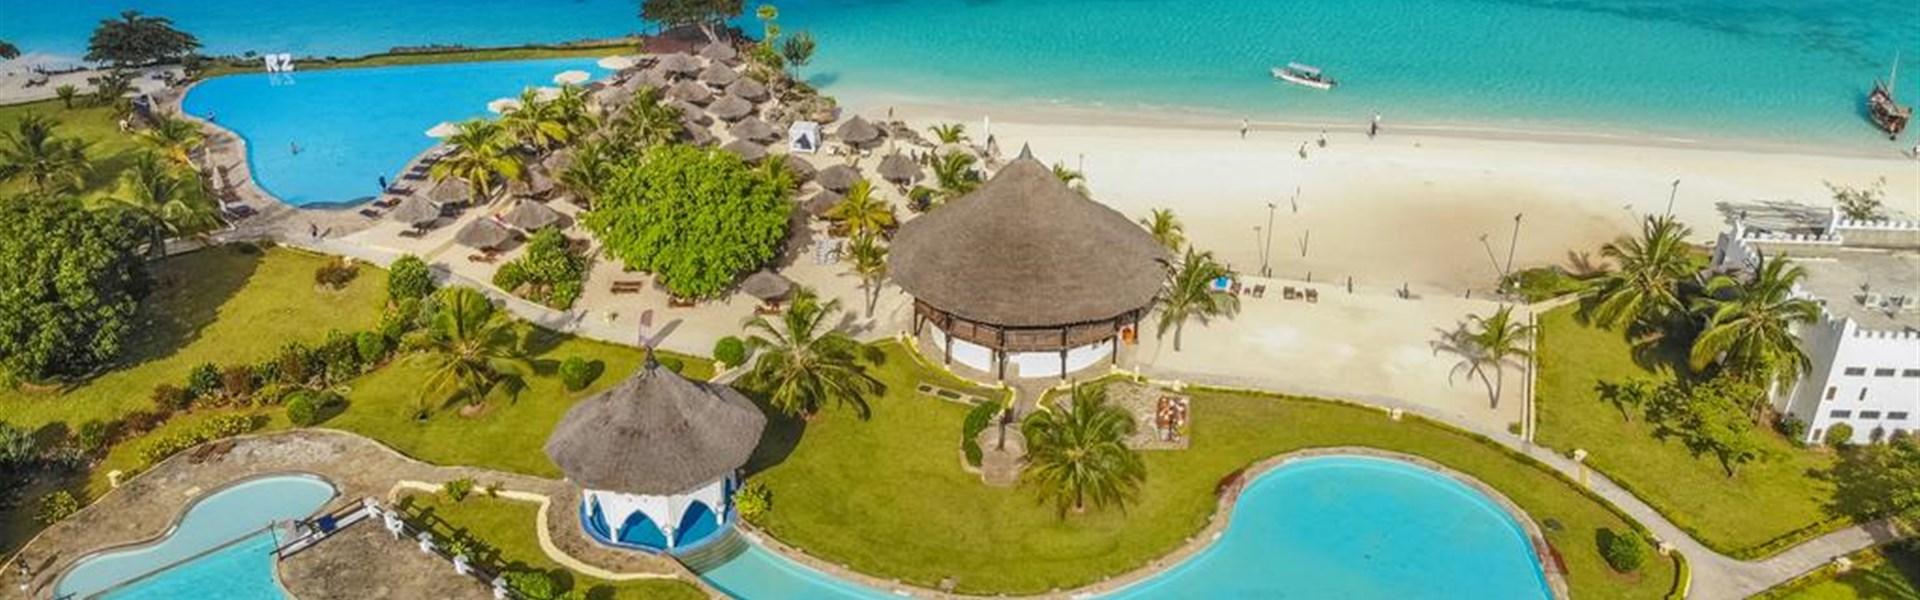 Marco Polo - Royal Zanzibar Beach Resort -